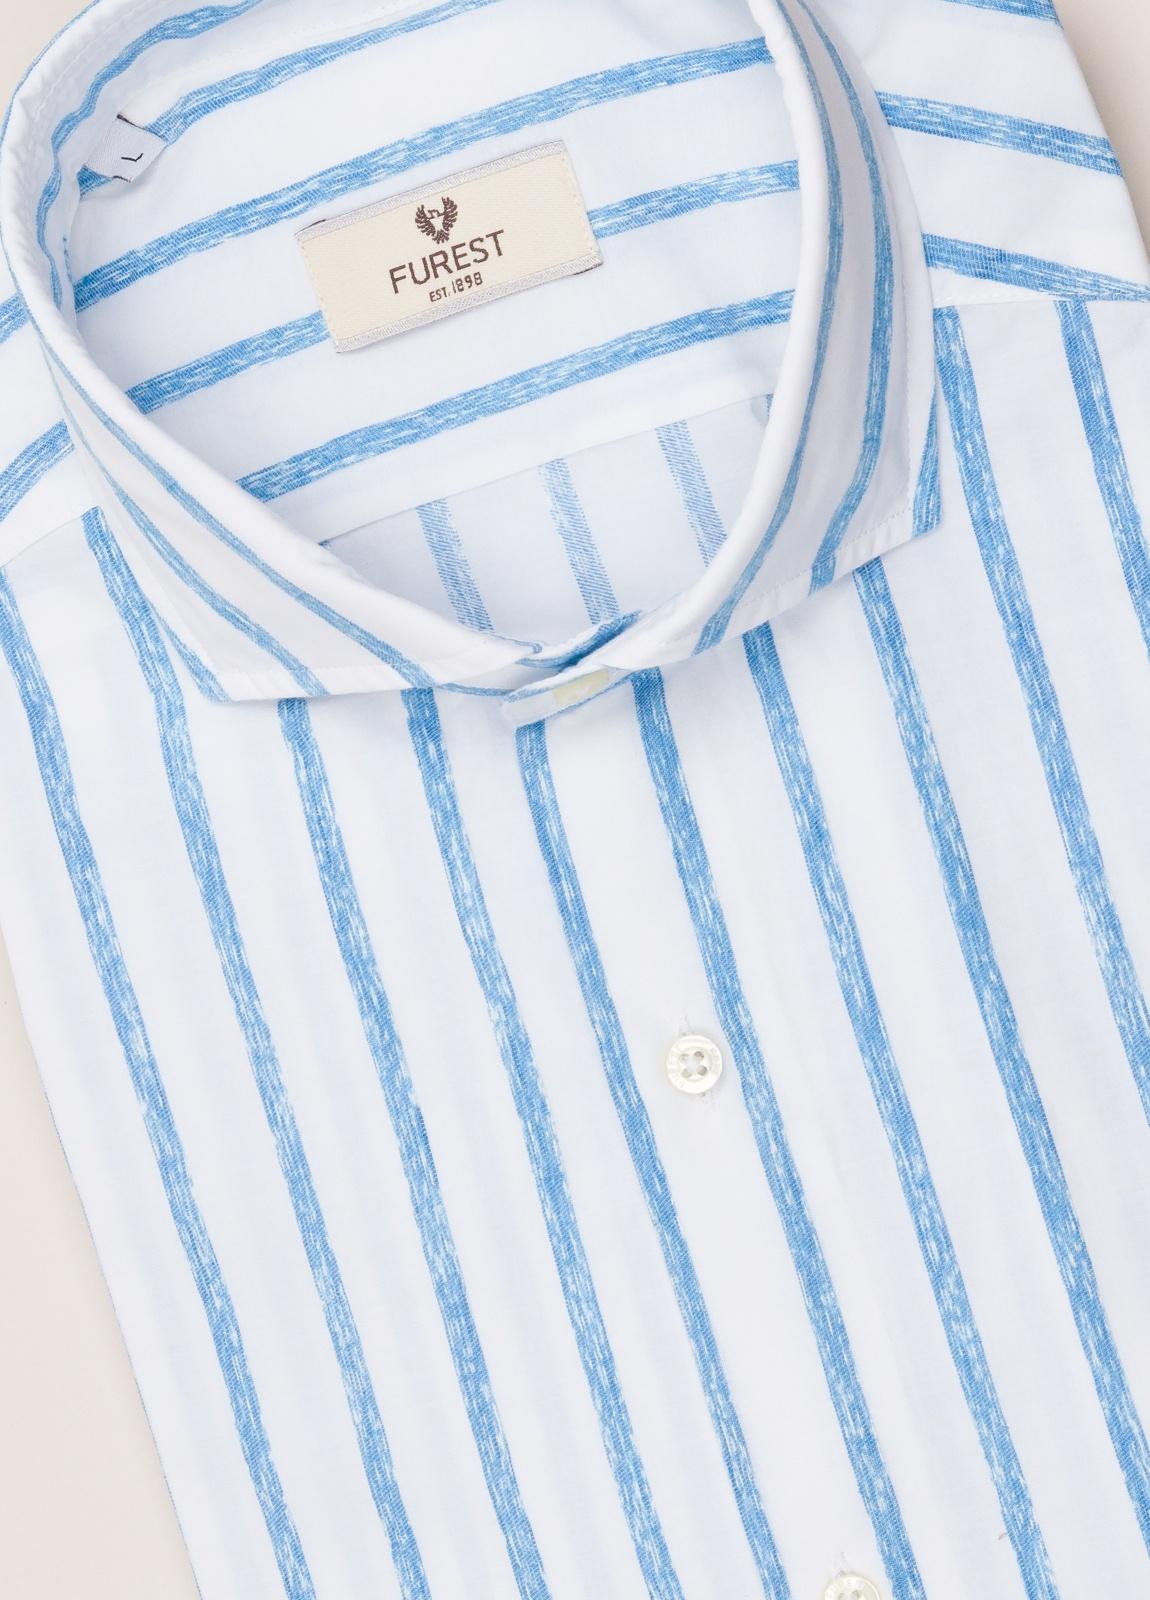 Camisa sport FUREST COLECCIÓN SLIM FIT rayas azul - Ítem2